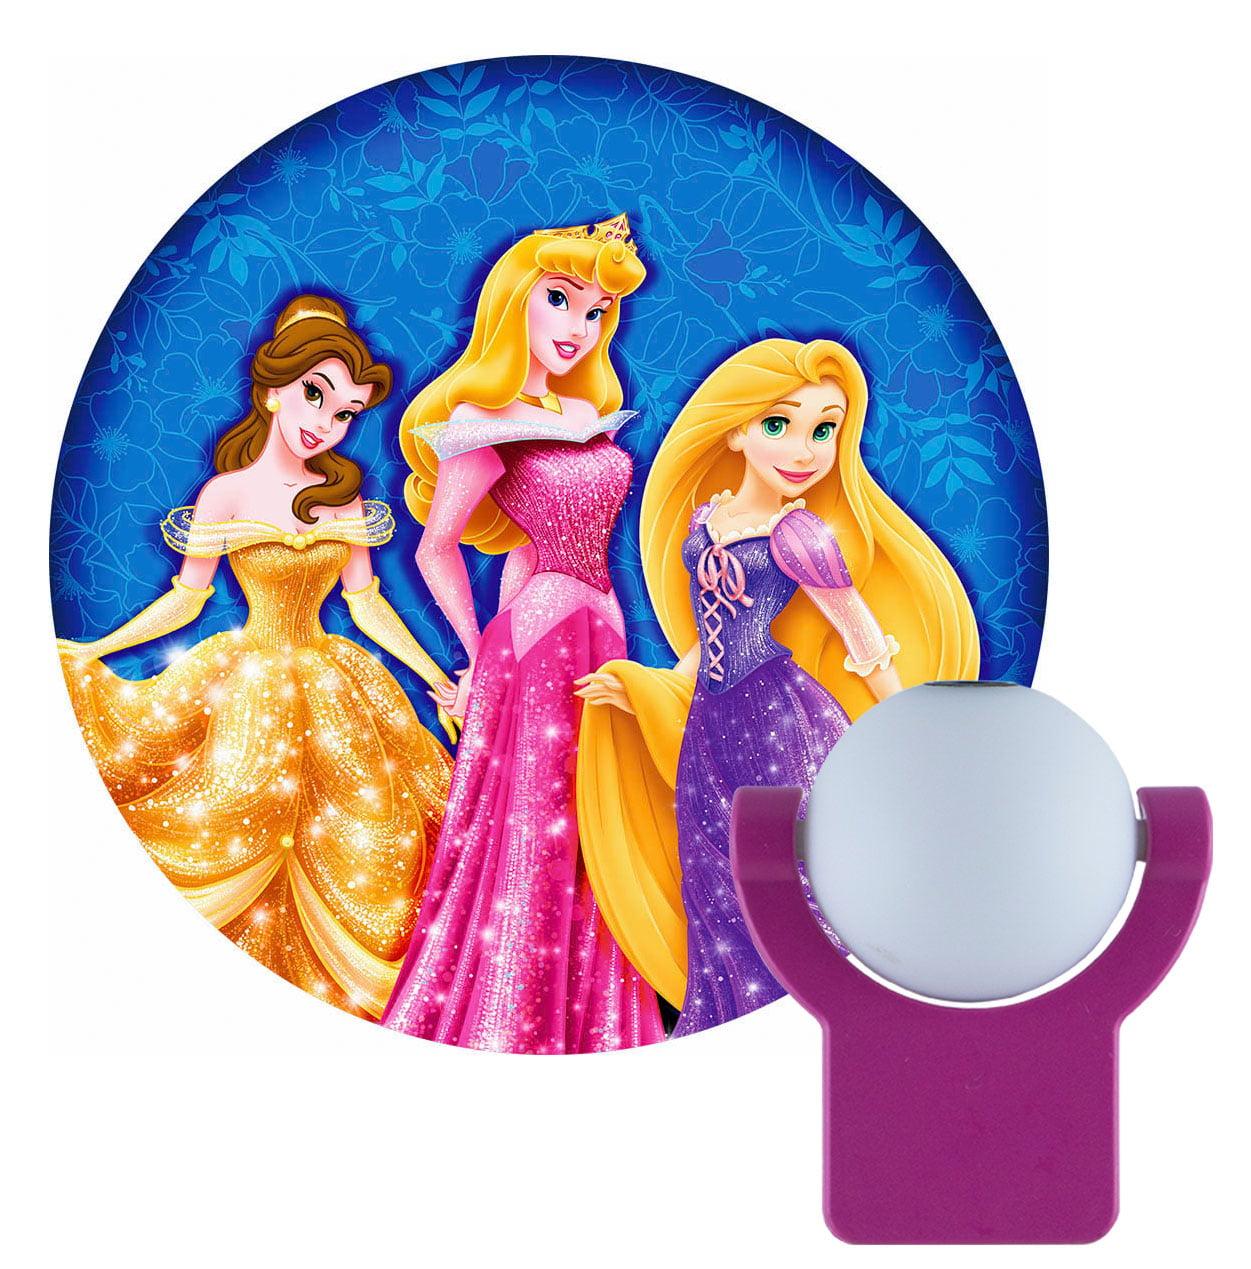 Projectables Disney Princesses LED Plug-In Night Light, Belle, Aurora, and Rapunzel Image, 11744